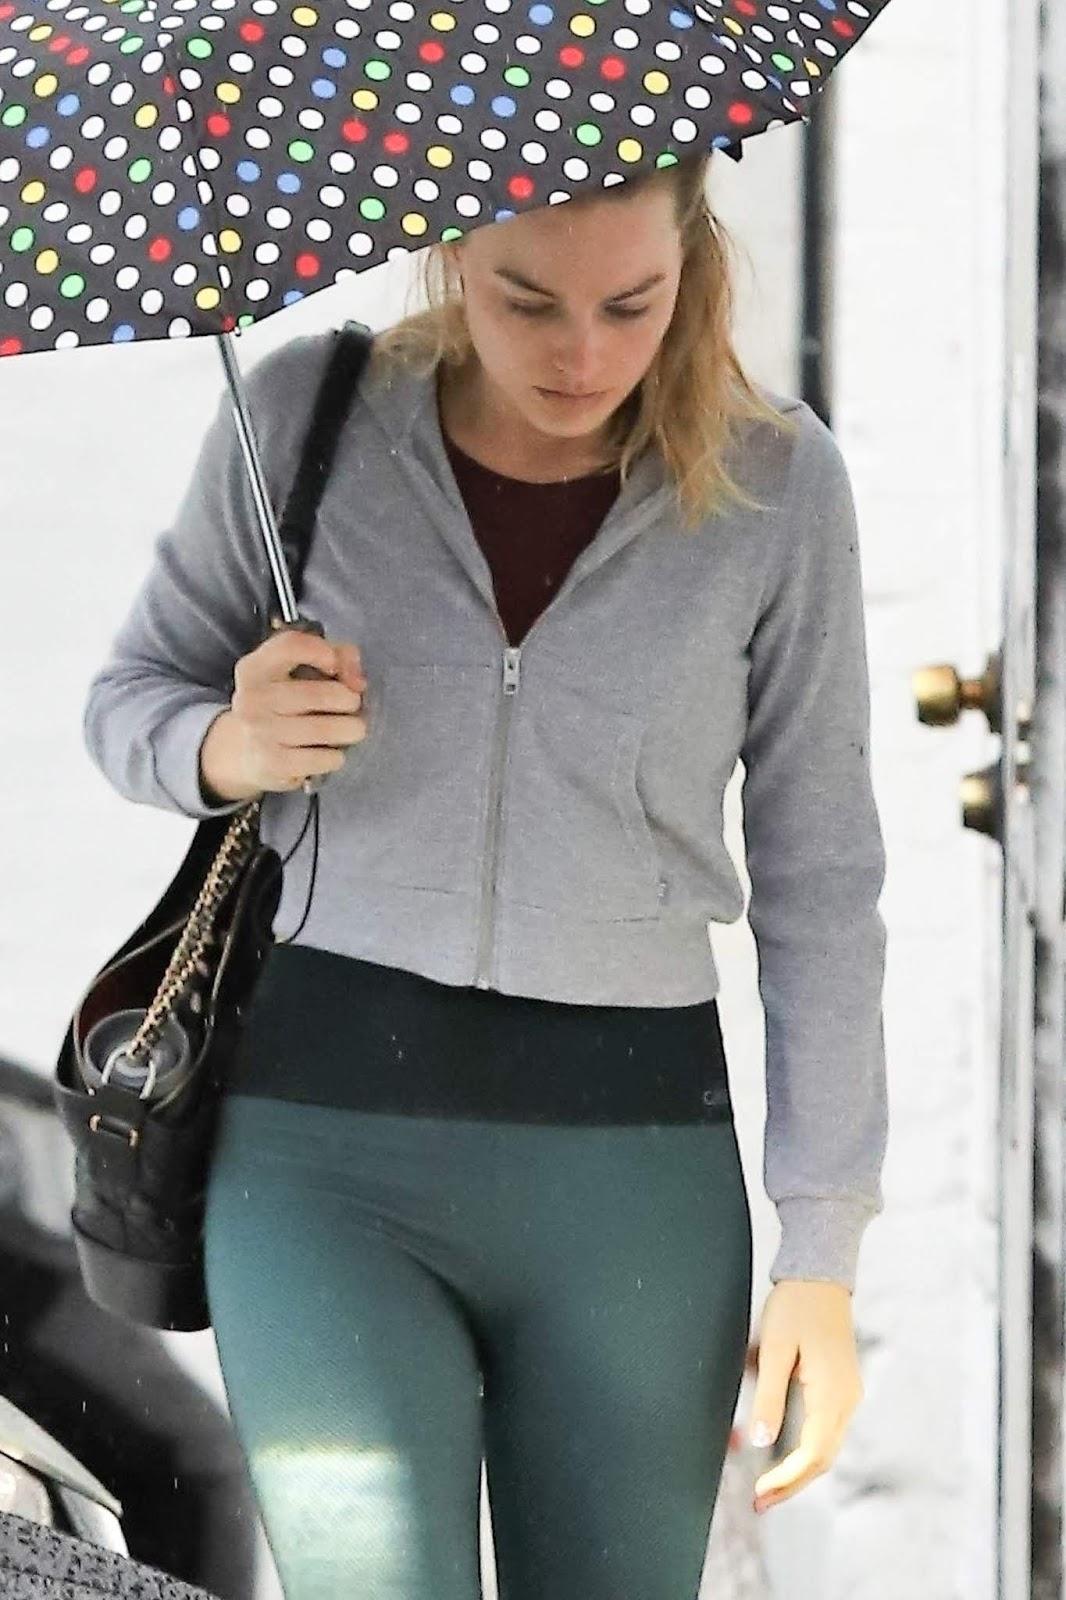 Margot Robbie hit the gyms in LA - 02/03/2019